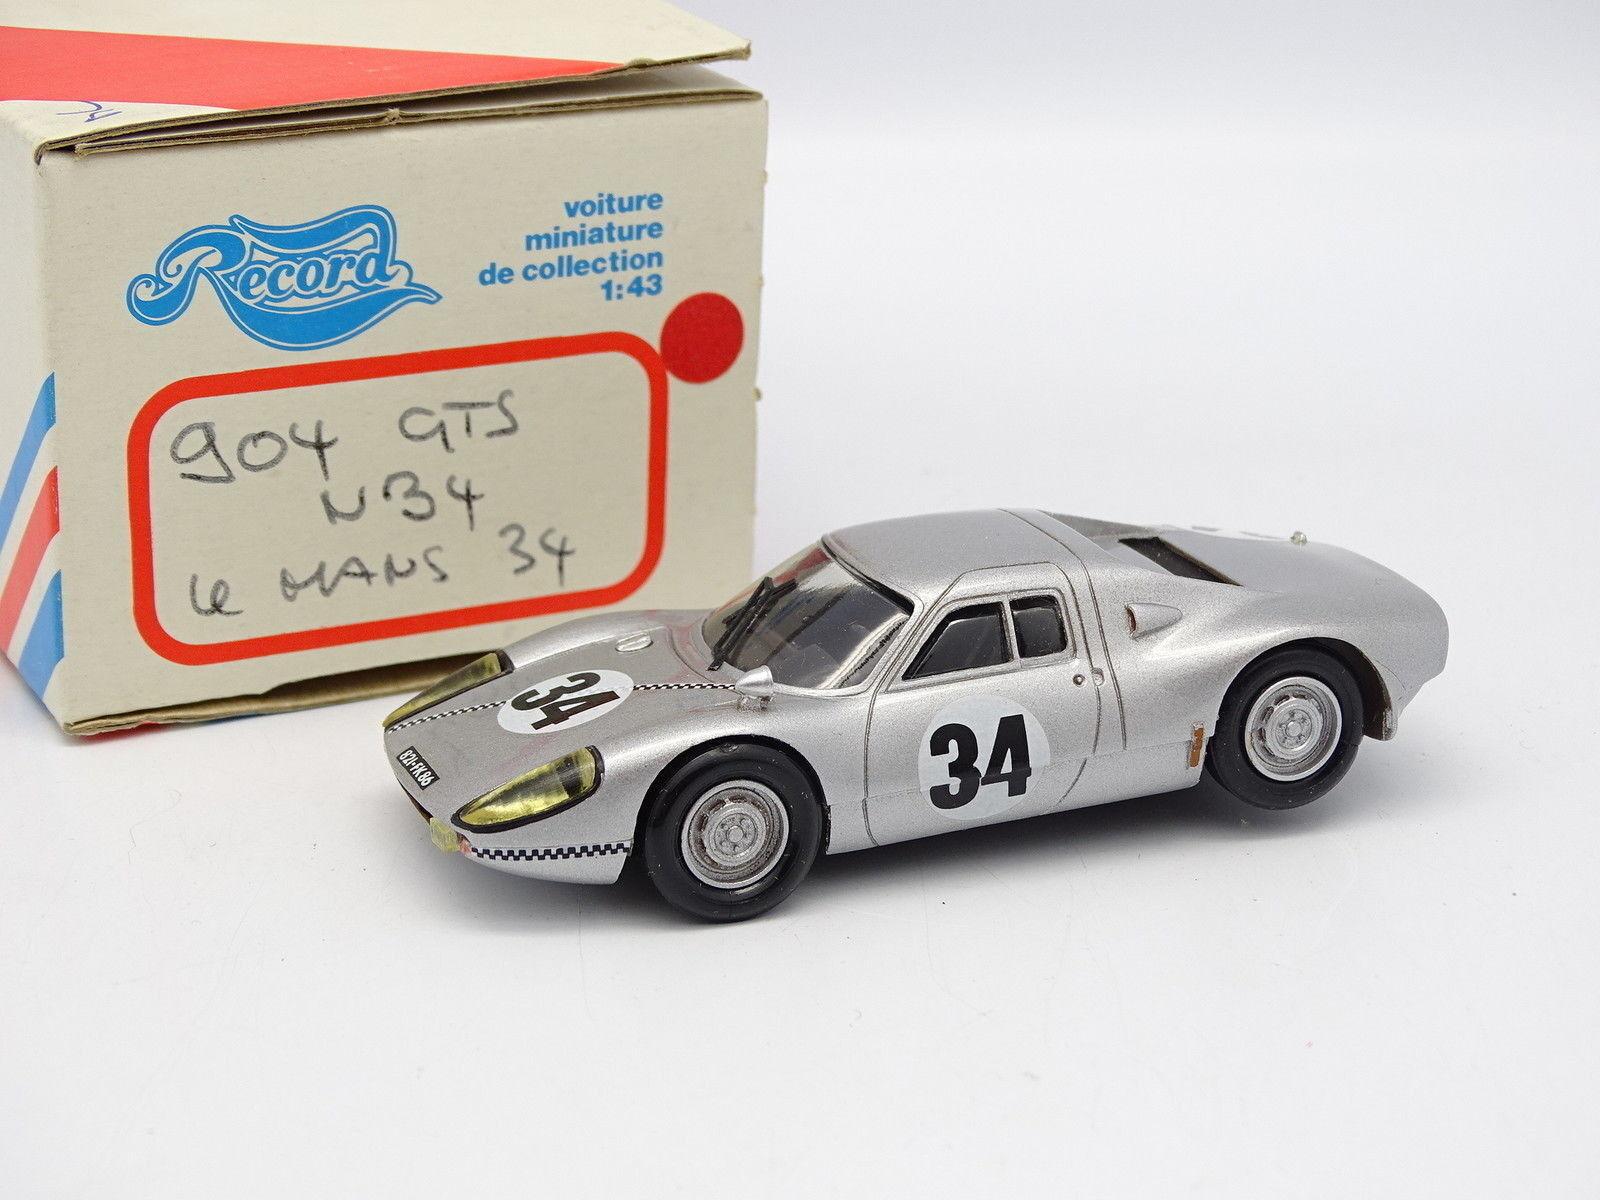 Record Kit Montato Resina 1/43 - Porsche 904 GTS N.34 le Mans 1964